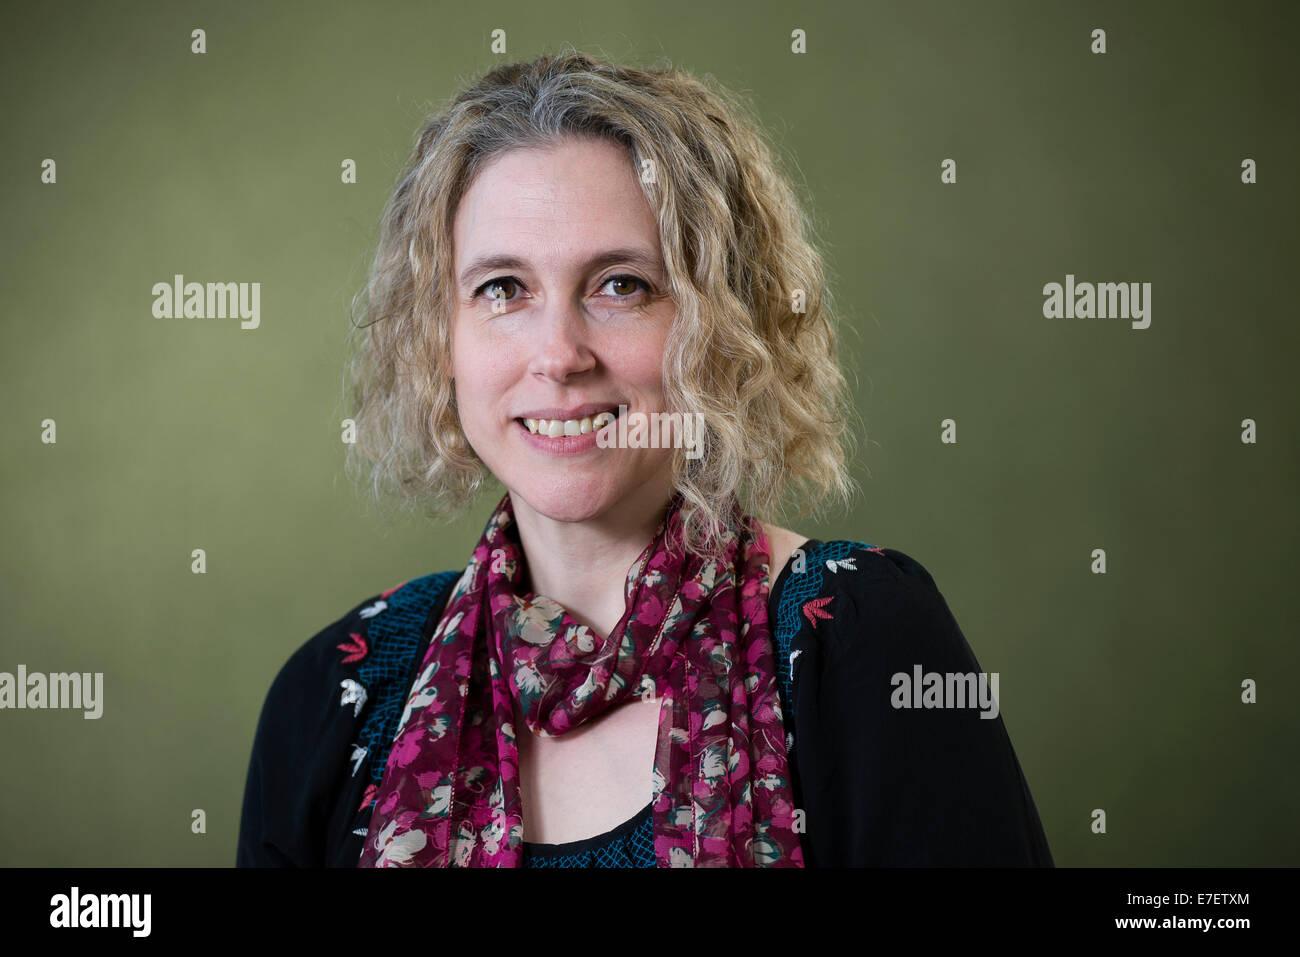 Author Rebecca Mascull appears at the Edinburgh International Book Festival. - Stock Image